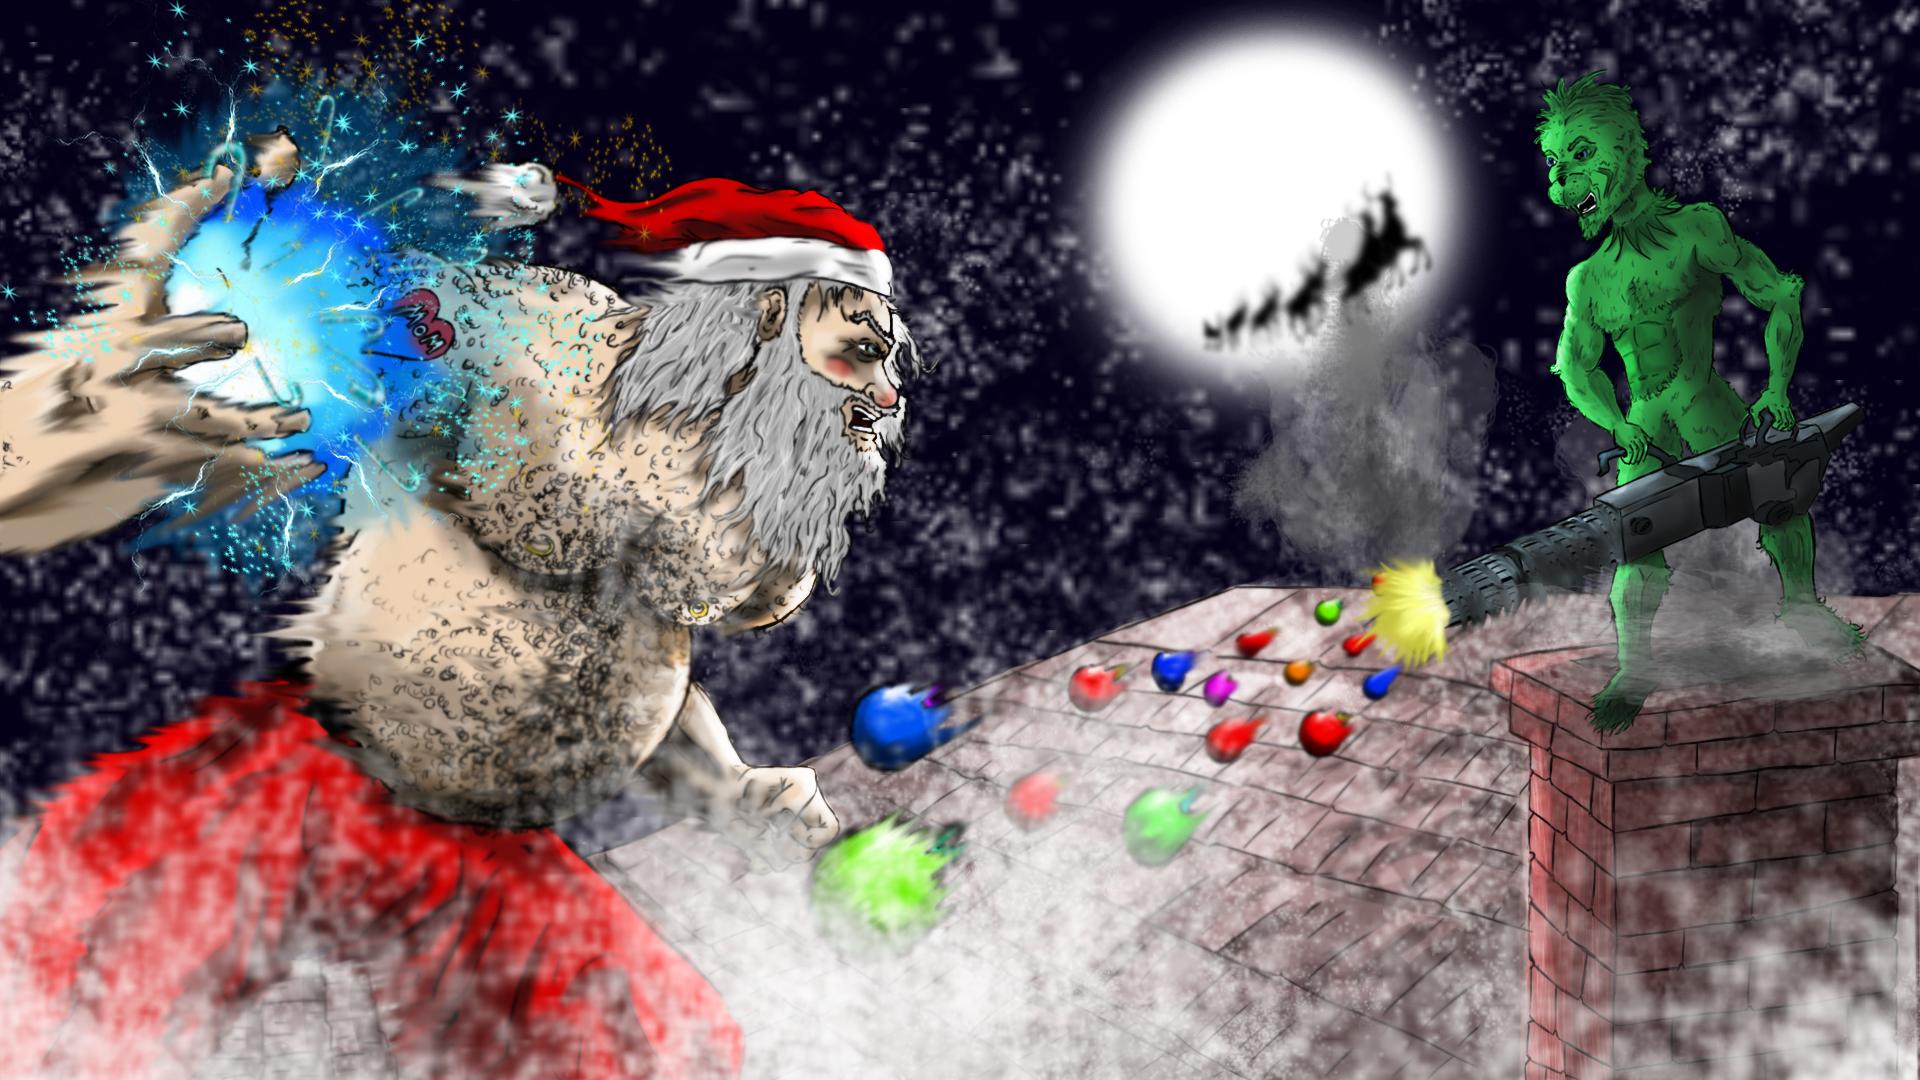 Epic Battle for Christmas